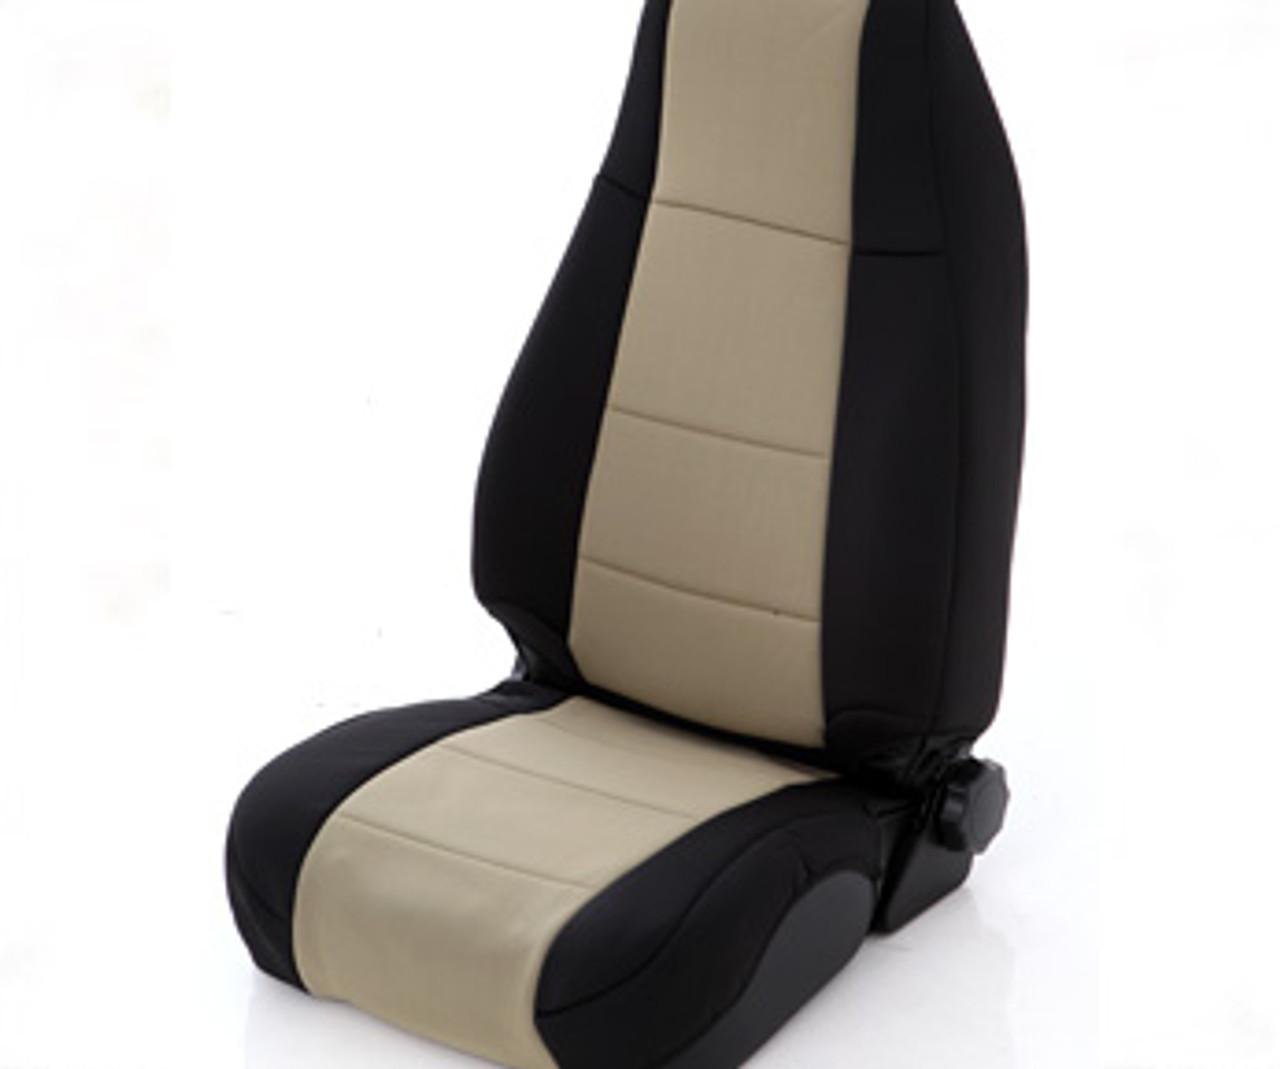 Smittybilt Neoprene Seat Cover in Black/Tan